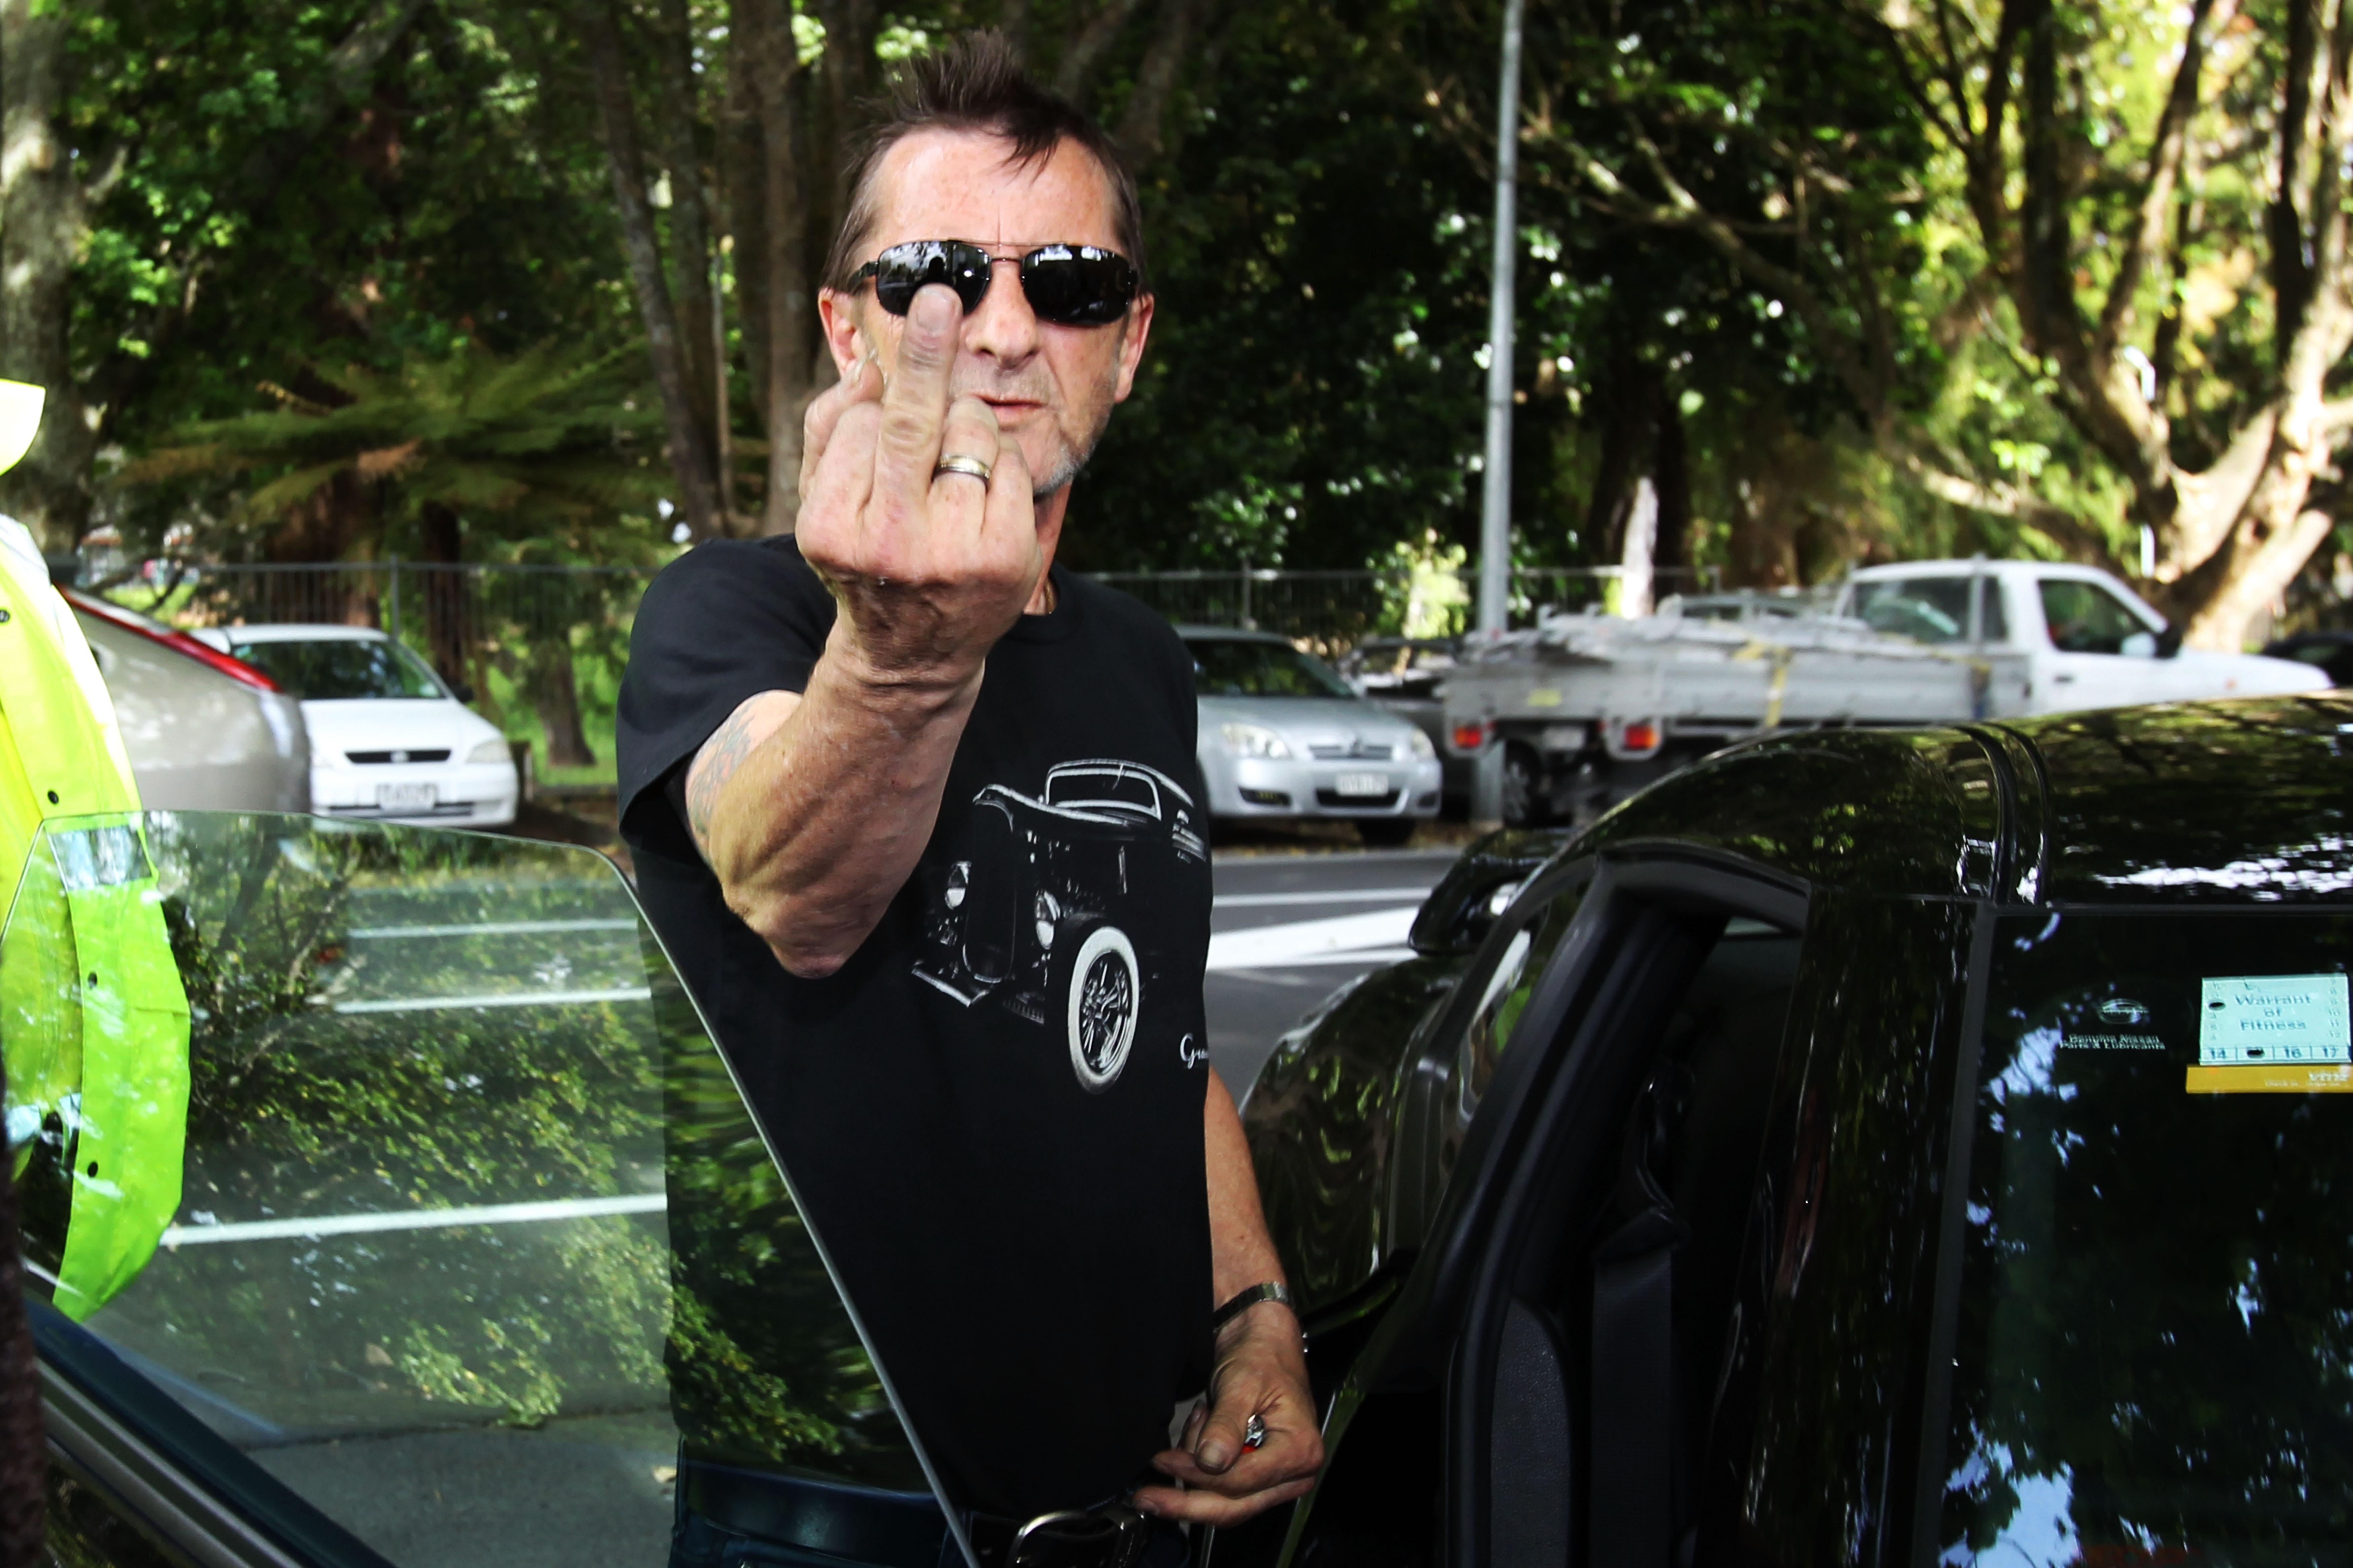 TAURANGA, NEW ZEALAND - NOVEMBER 26:  AC/DC drummer Phil Rudd gestures to members of the media after leaving Tauranga Distric